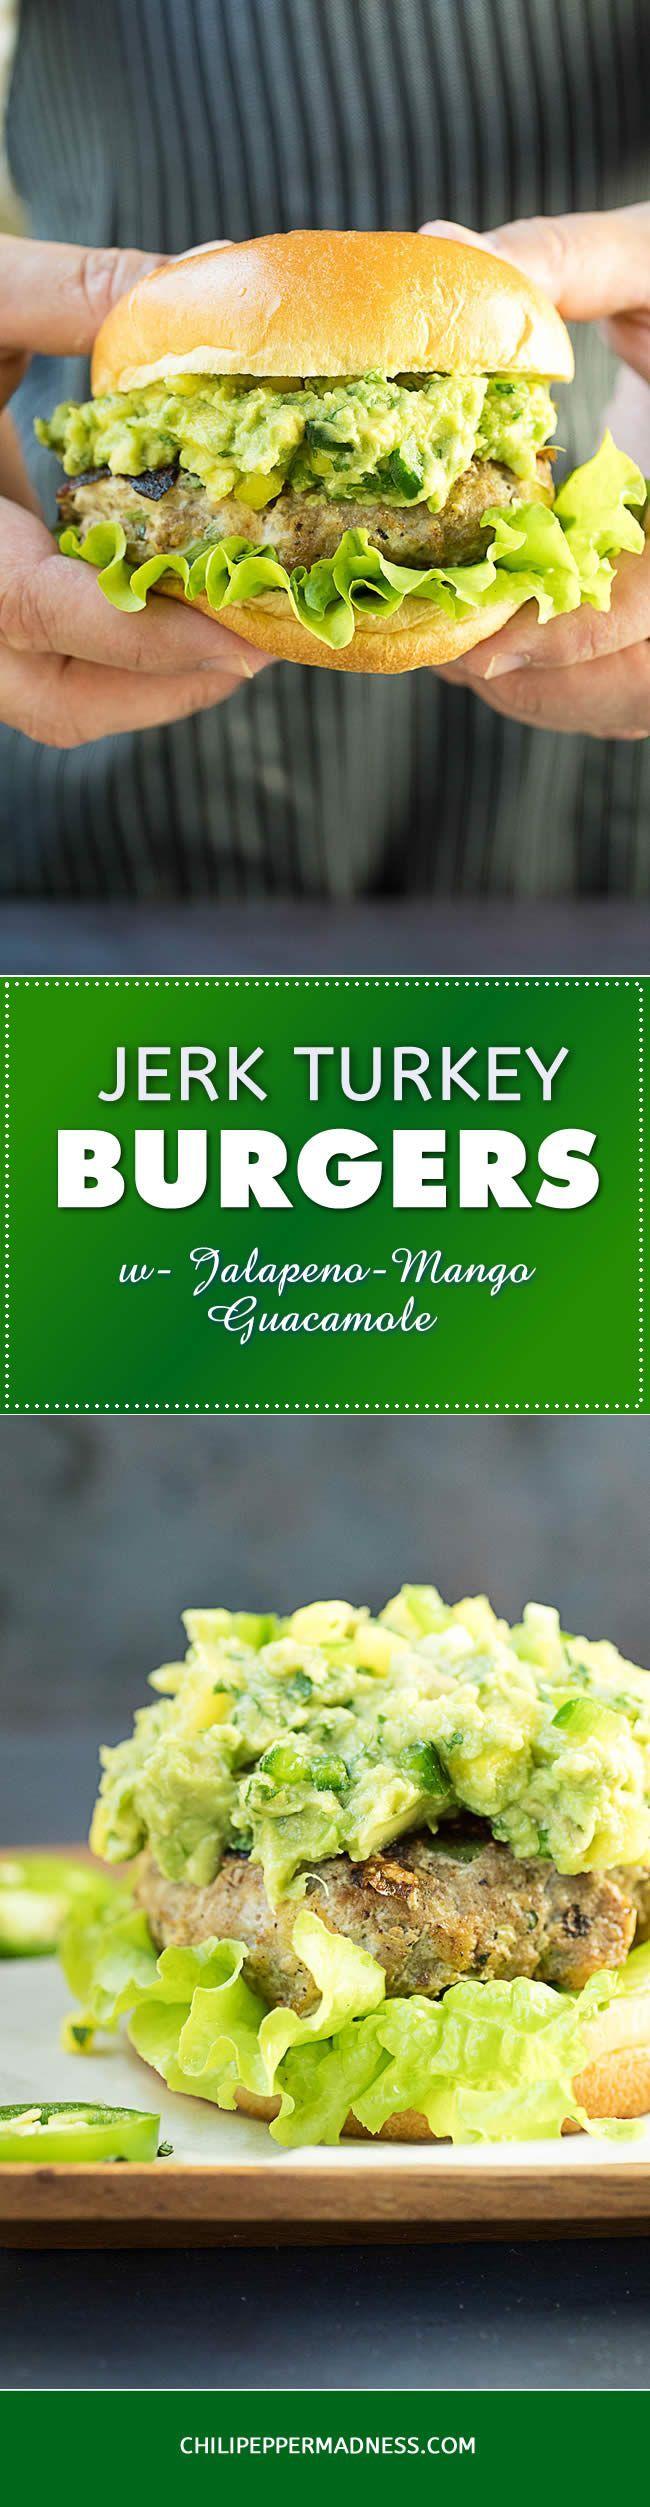 Jerk Turkey Burgers with Jalapeno-Mango Guacamole - A recipe for juicy turkey burgers handmade with savory jerk seasonings, perfectly seared, then topped with fiery jalapeno-mango guacamole. It's burger time!